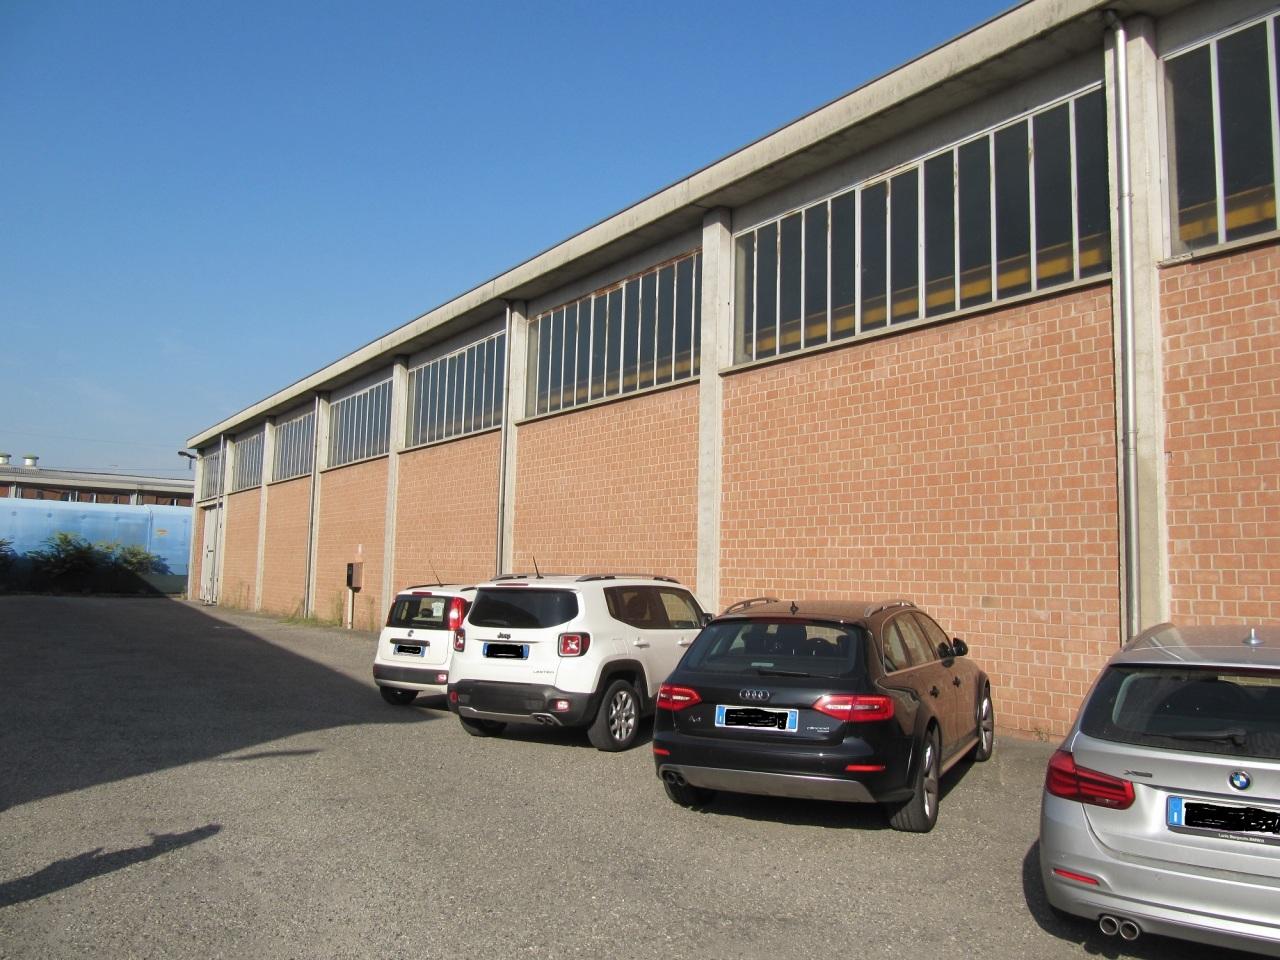 Capannone / Fondo - Industriale/Artigianale a Parma Città Ovest, Parma Rif. 11221689